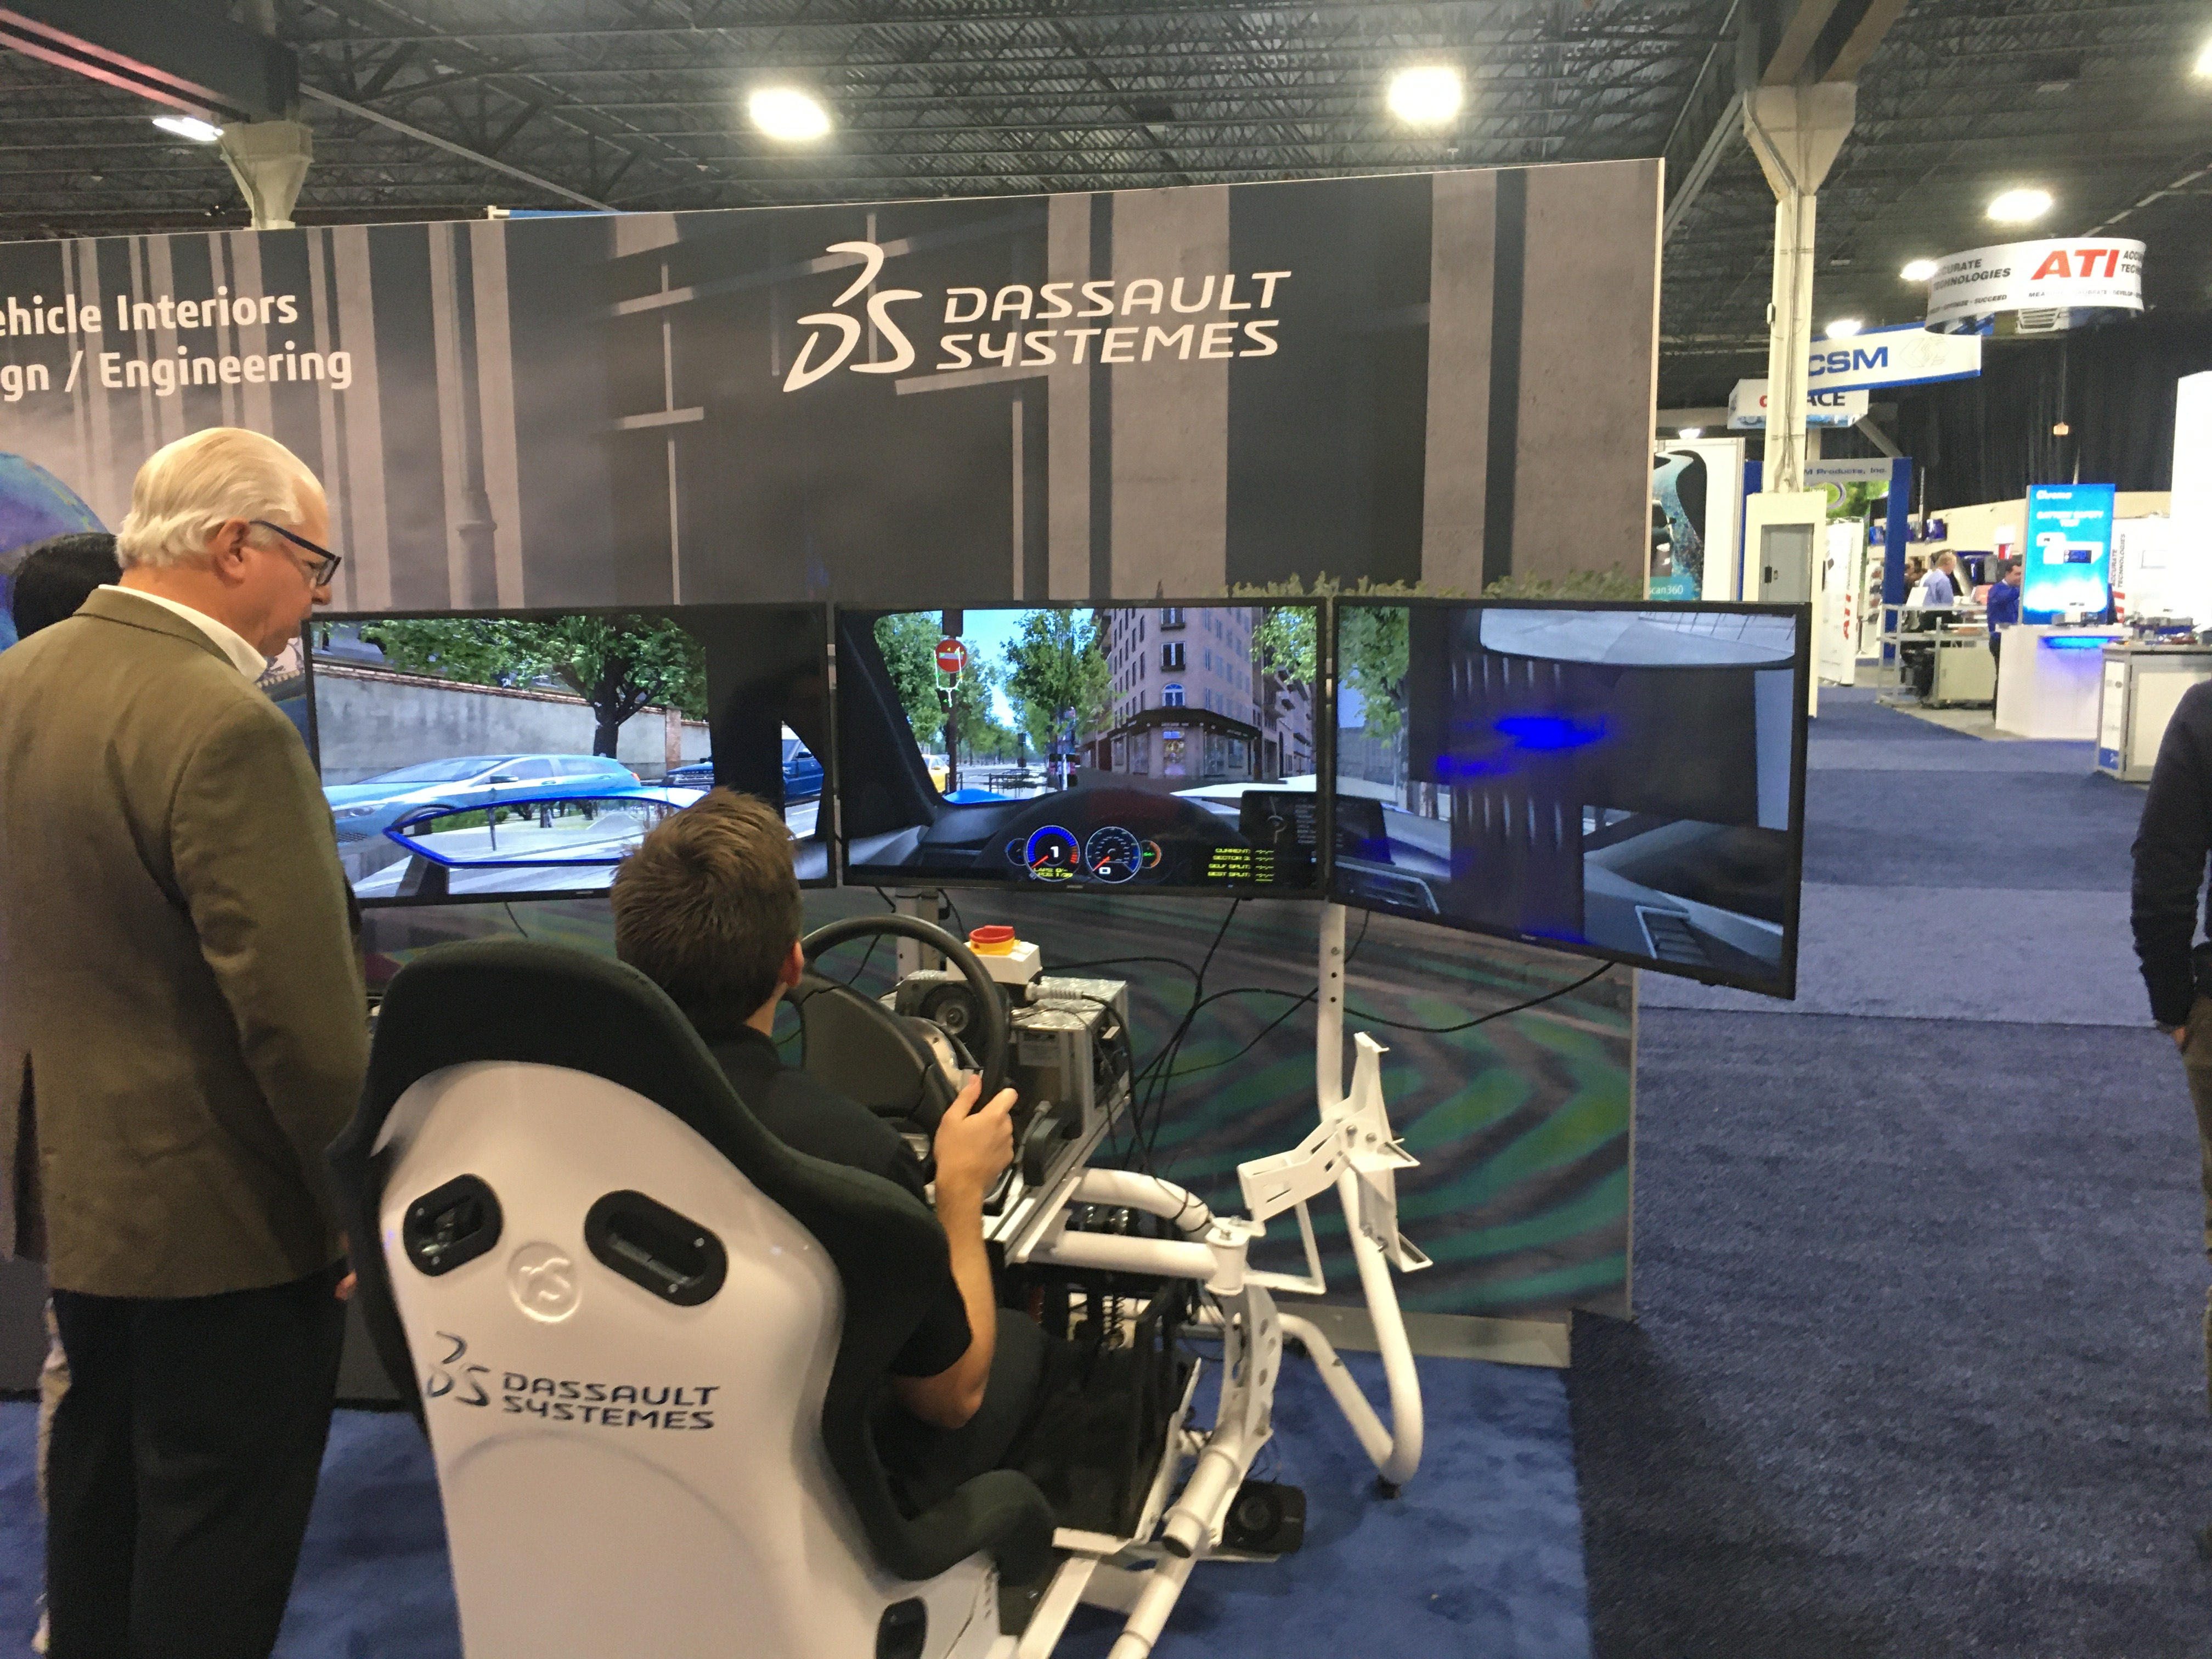 Avt Expo Novi Mechanical Design And Software Simulation Autonomous Vehicle International